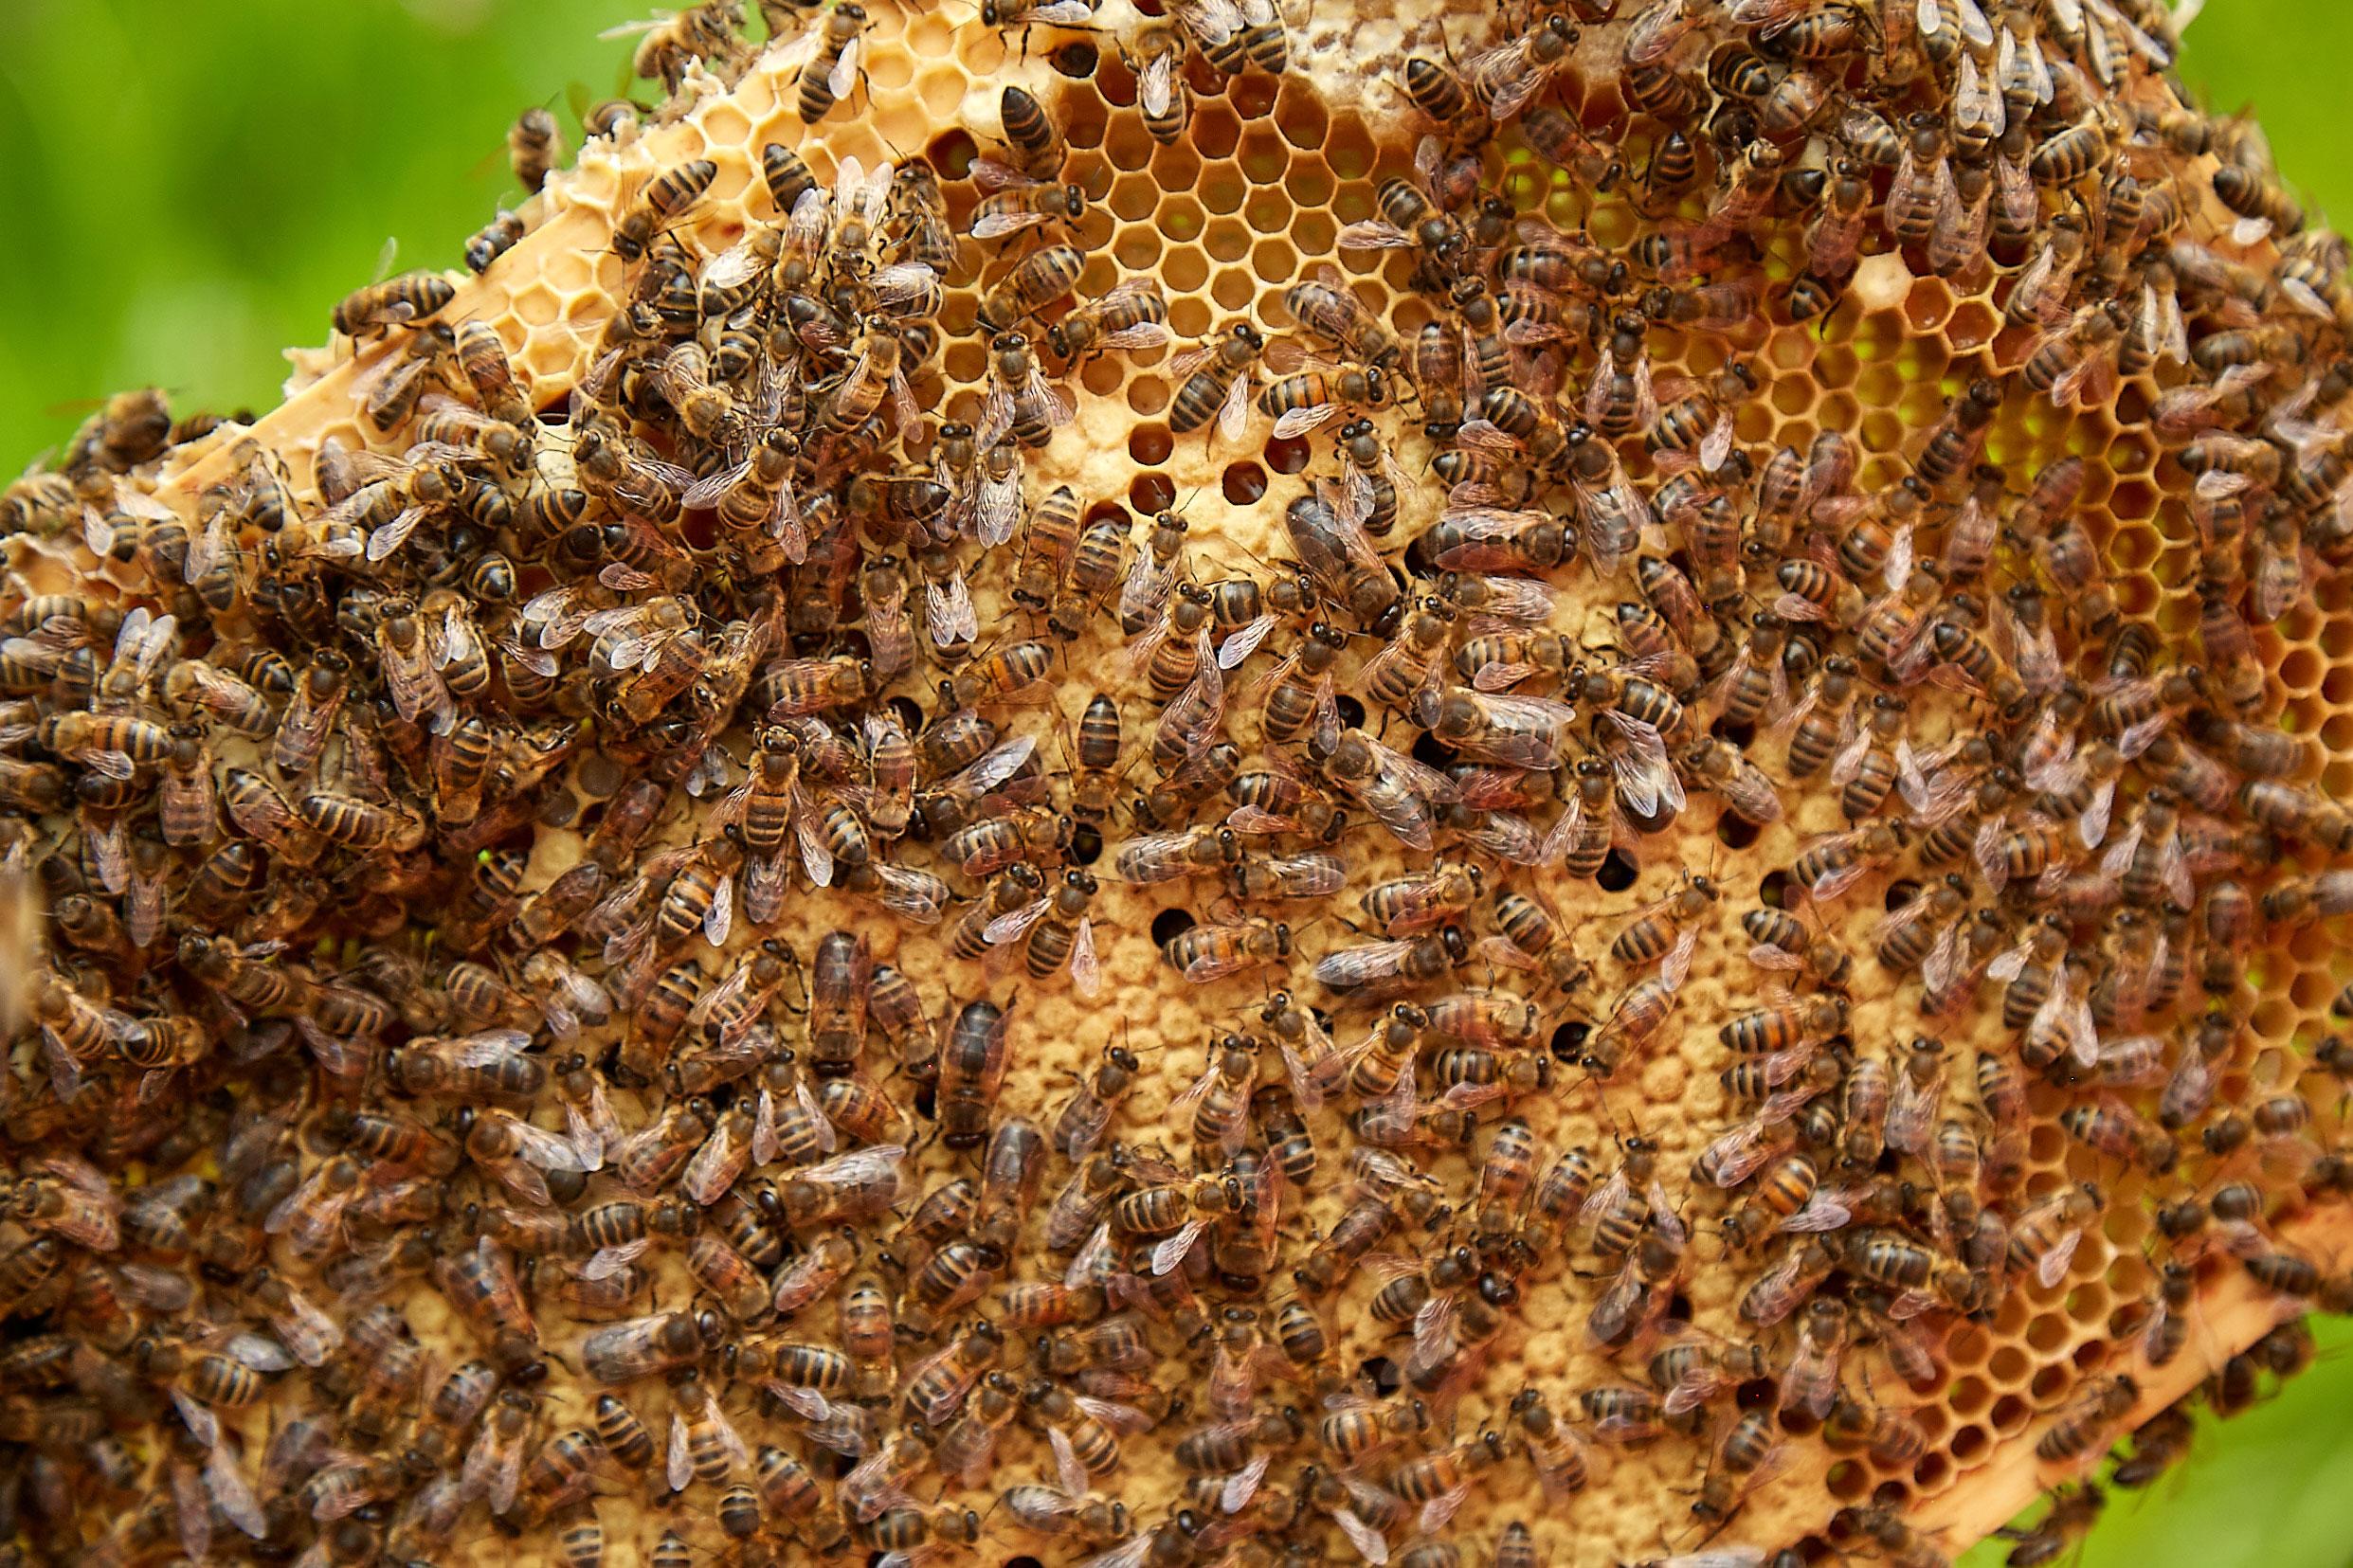 Honey-bees-and-honeycomb.jpg